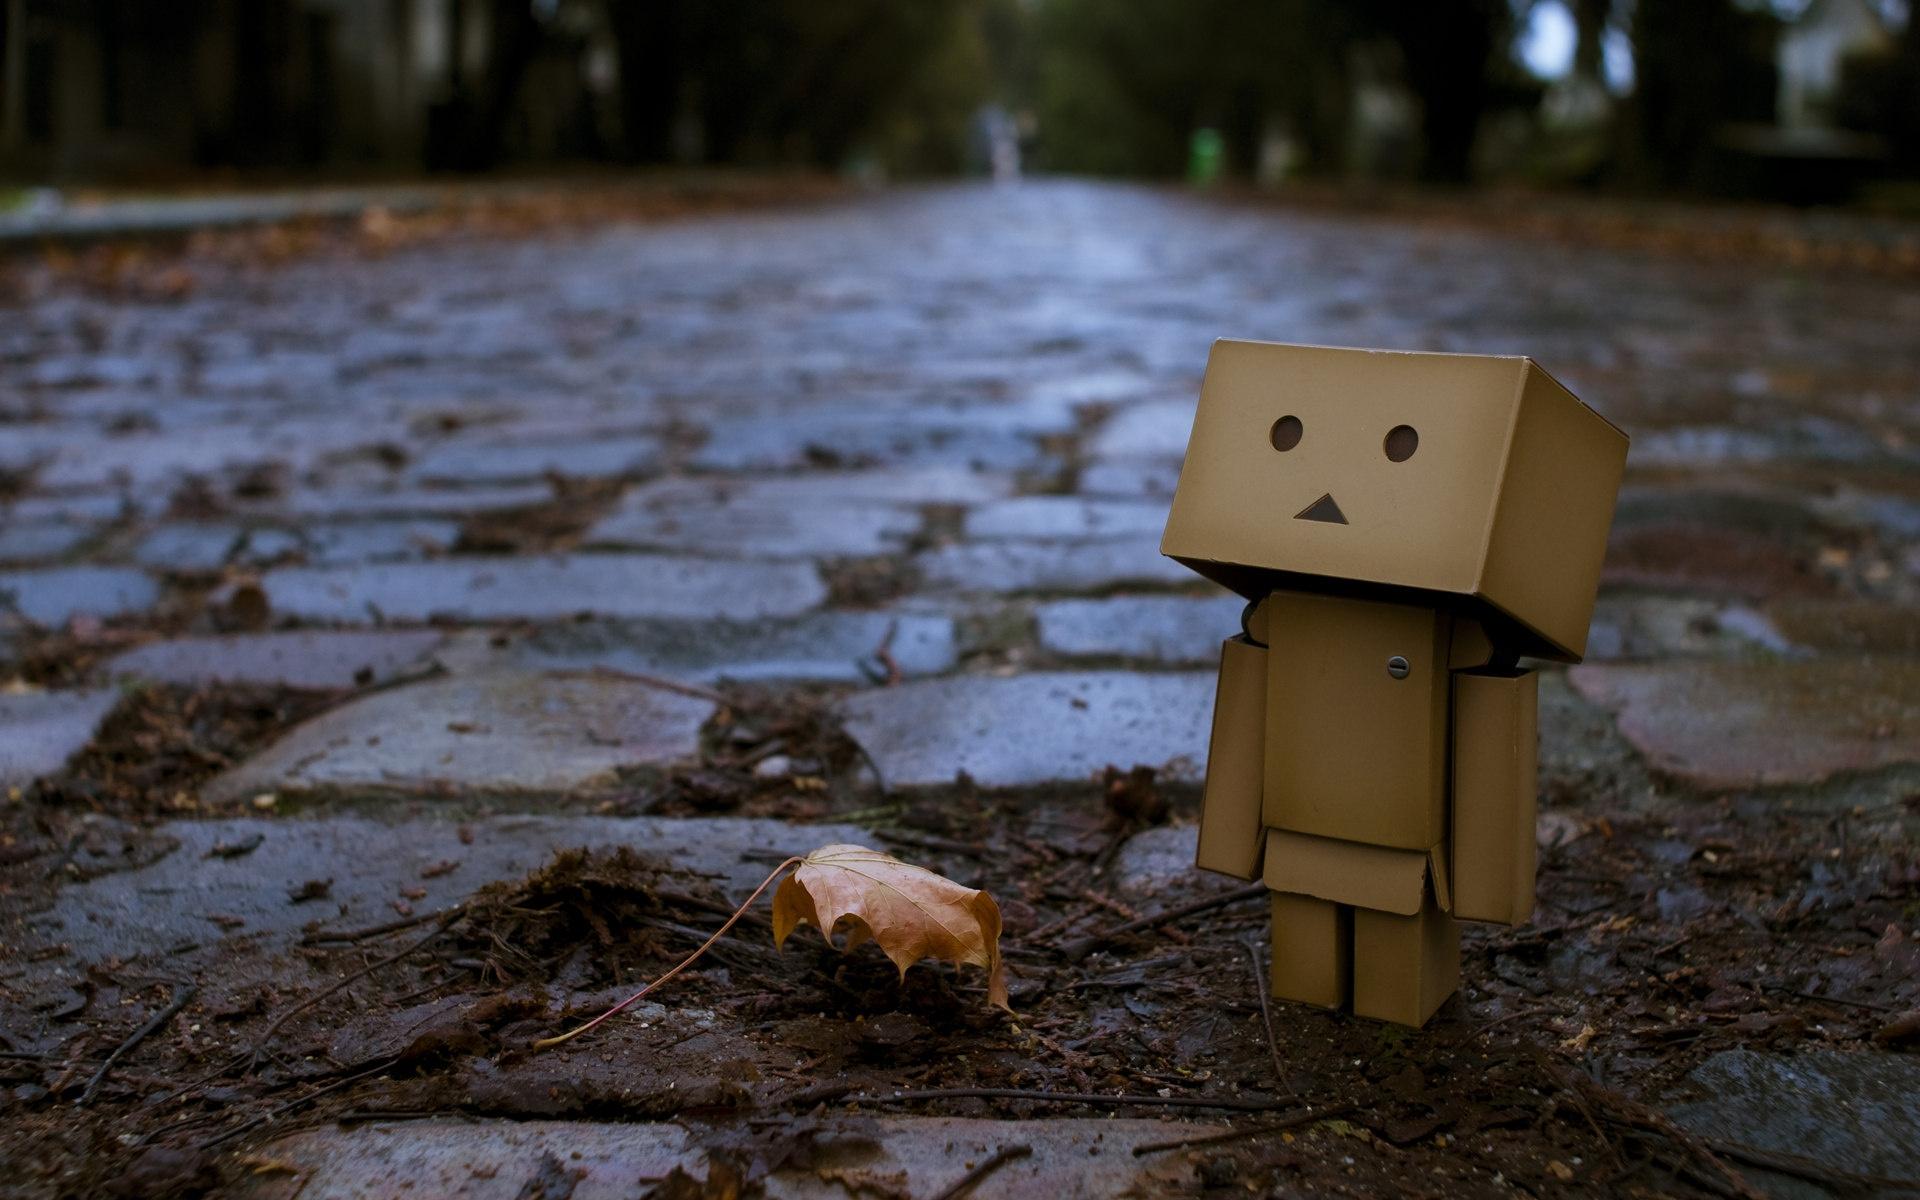 Картинки Danboard, коробки, робот, тротуар, листья, осень, клен фото и обои на рабочий стол